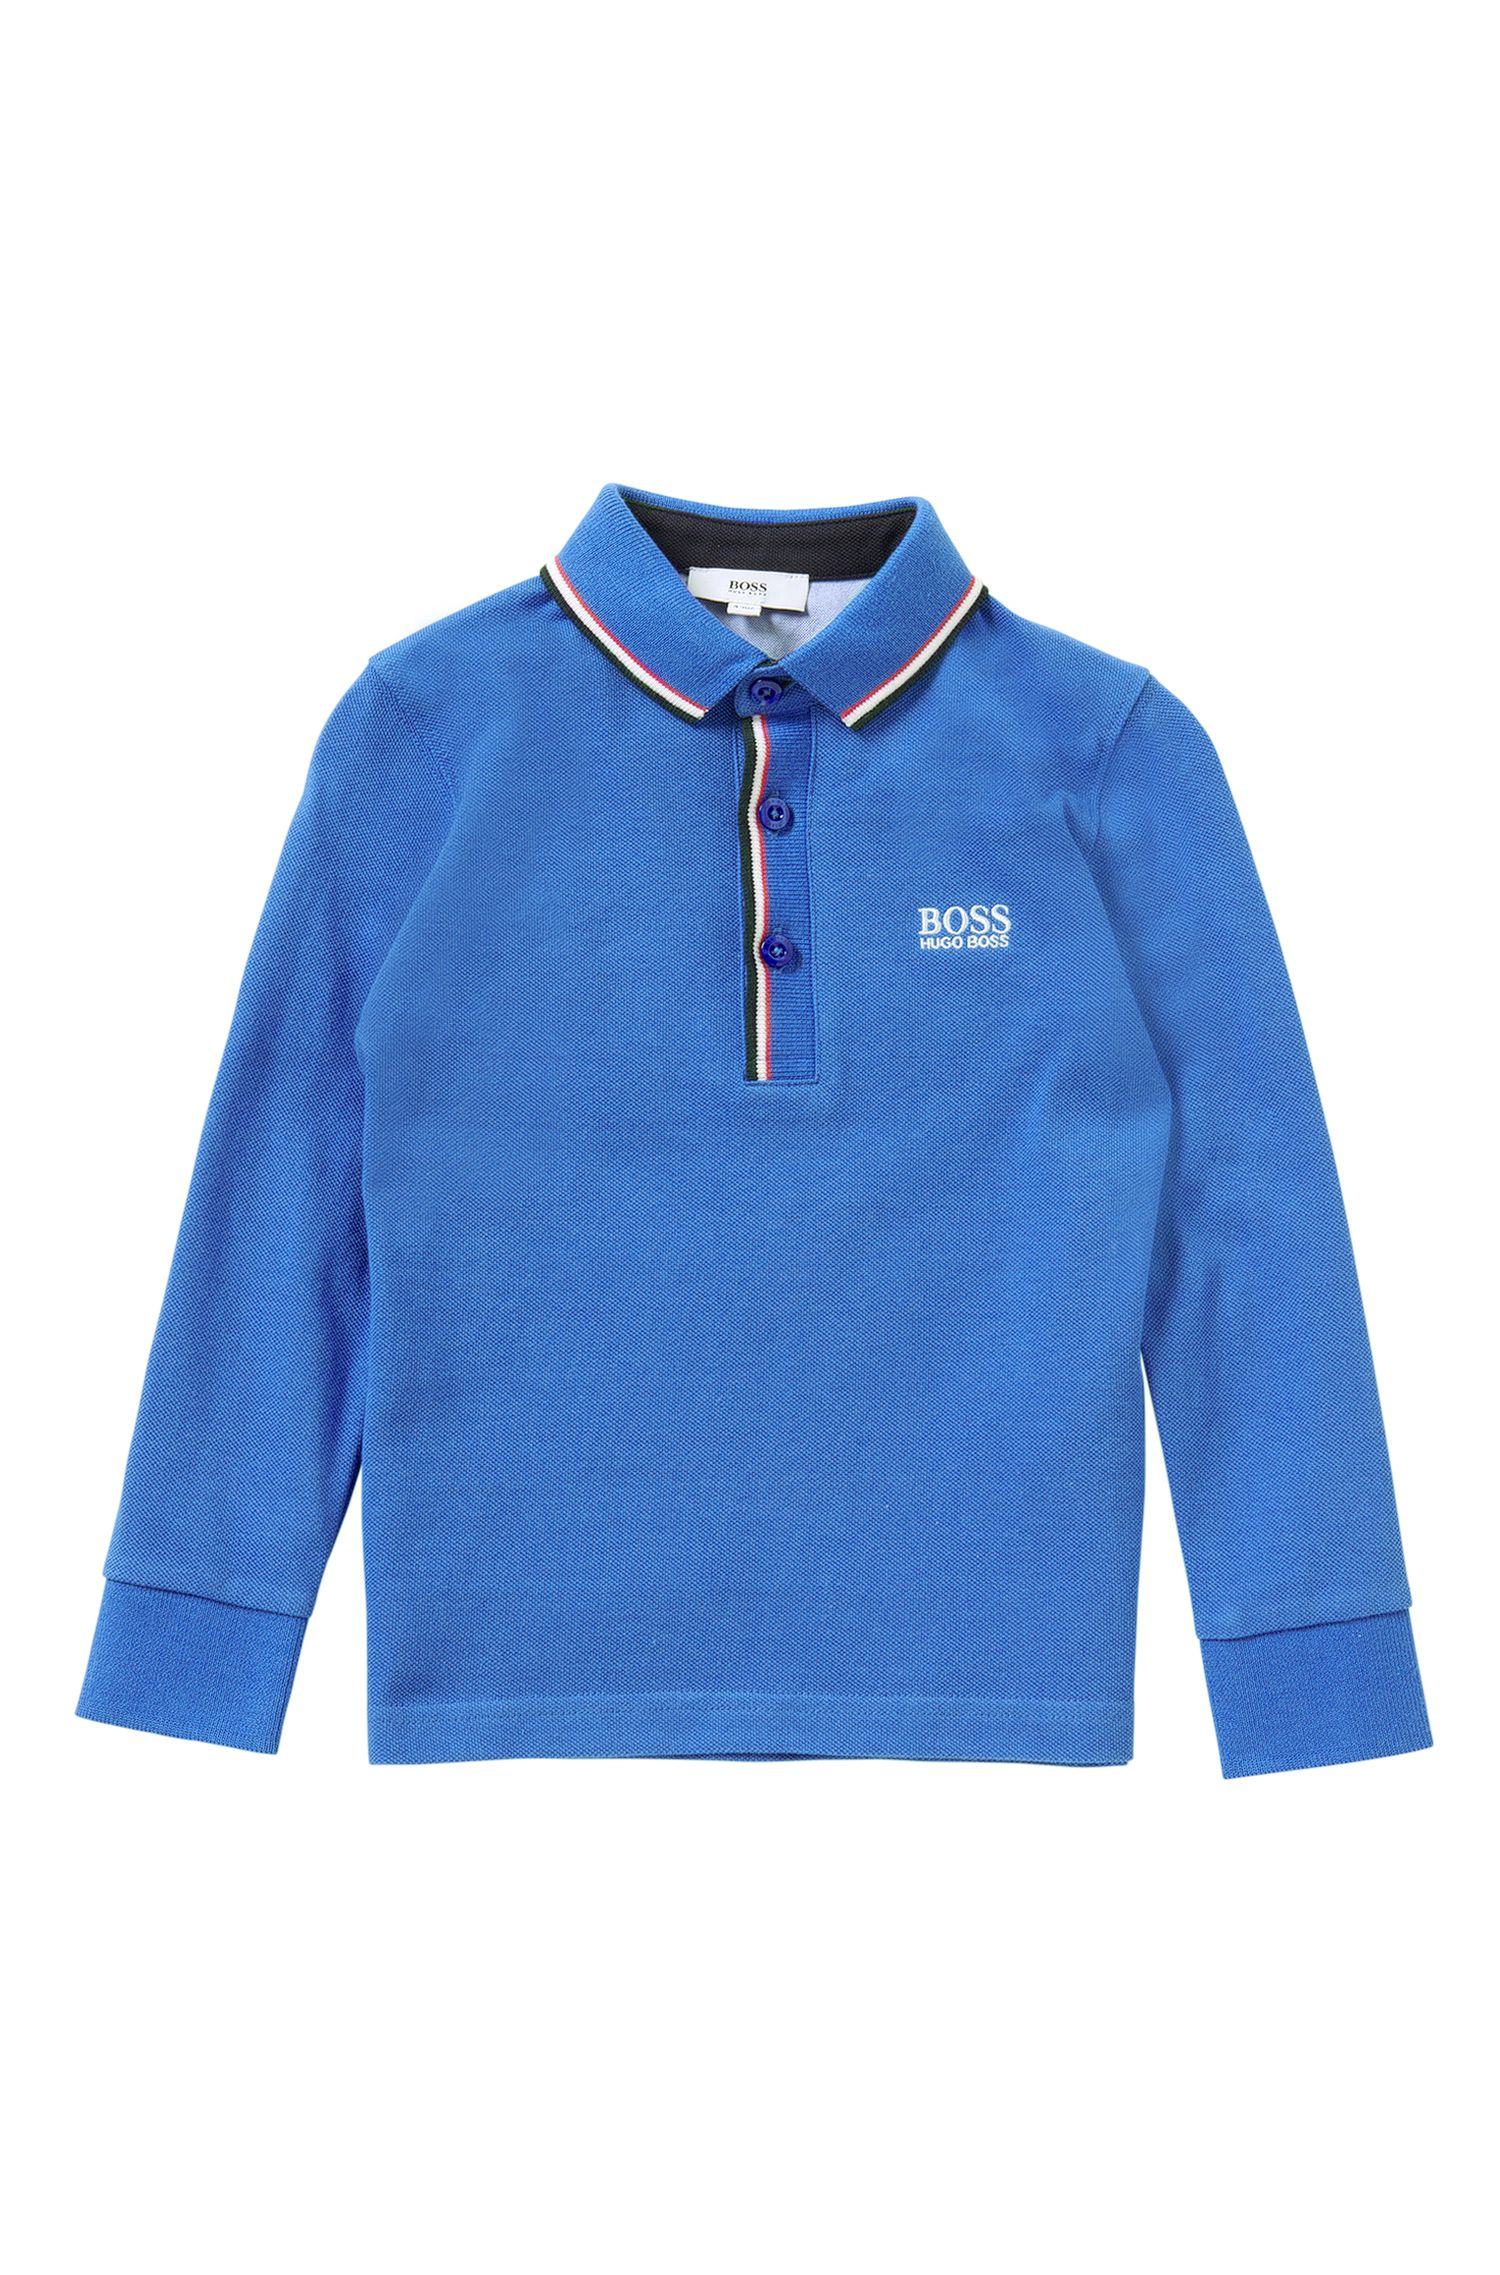 Plain kids' long-sleeved polo shirt in cotton: 'J25925'